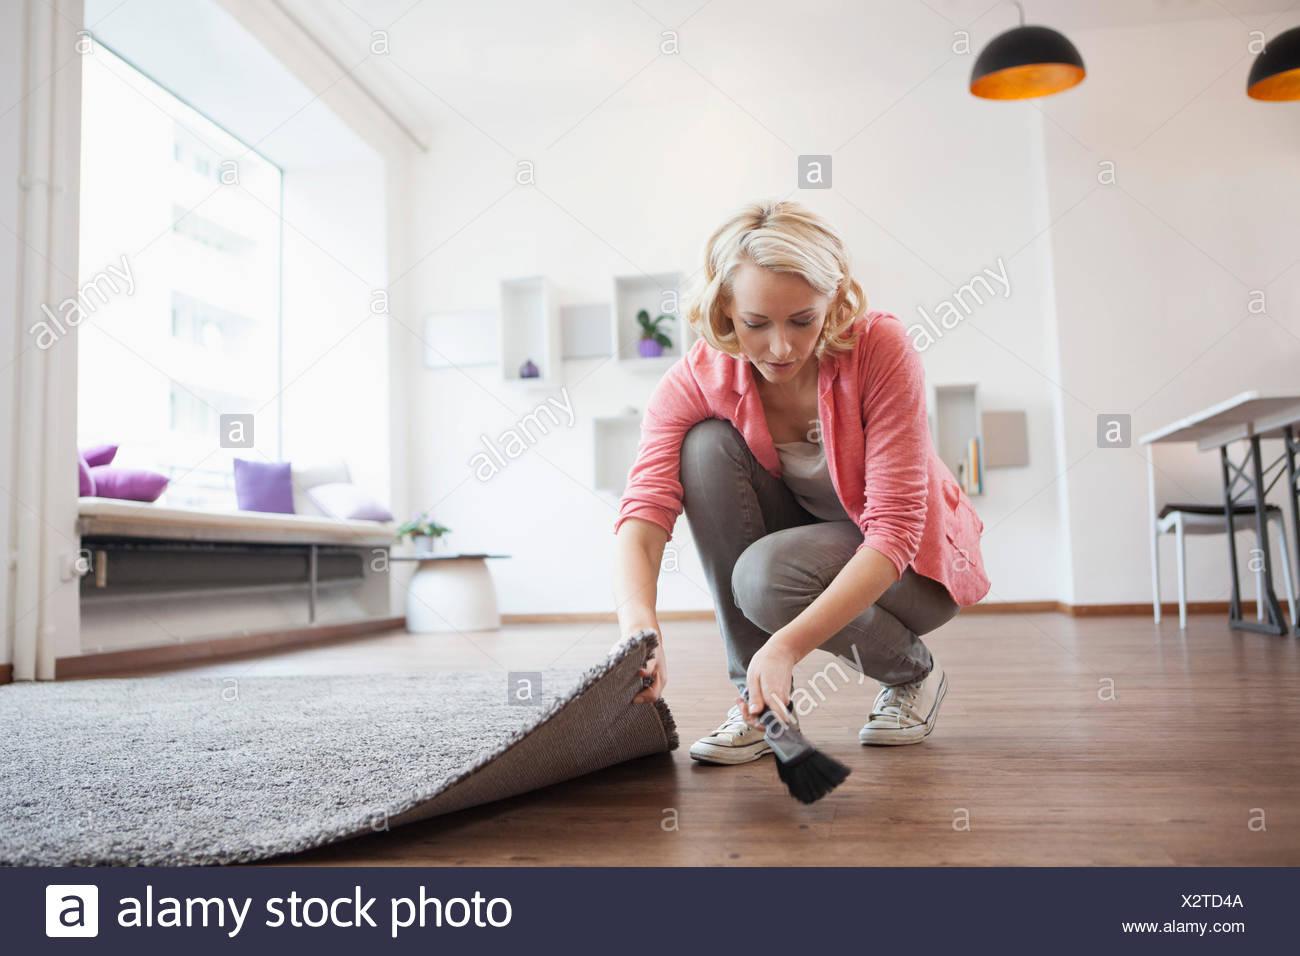 Using Air Brush In Living Room